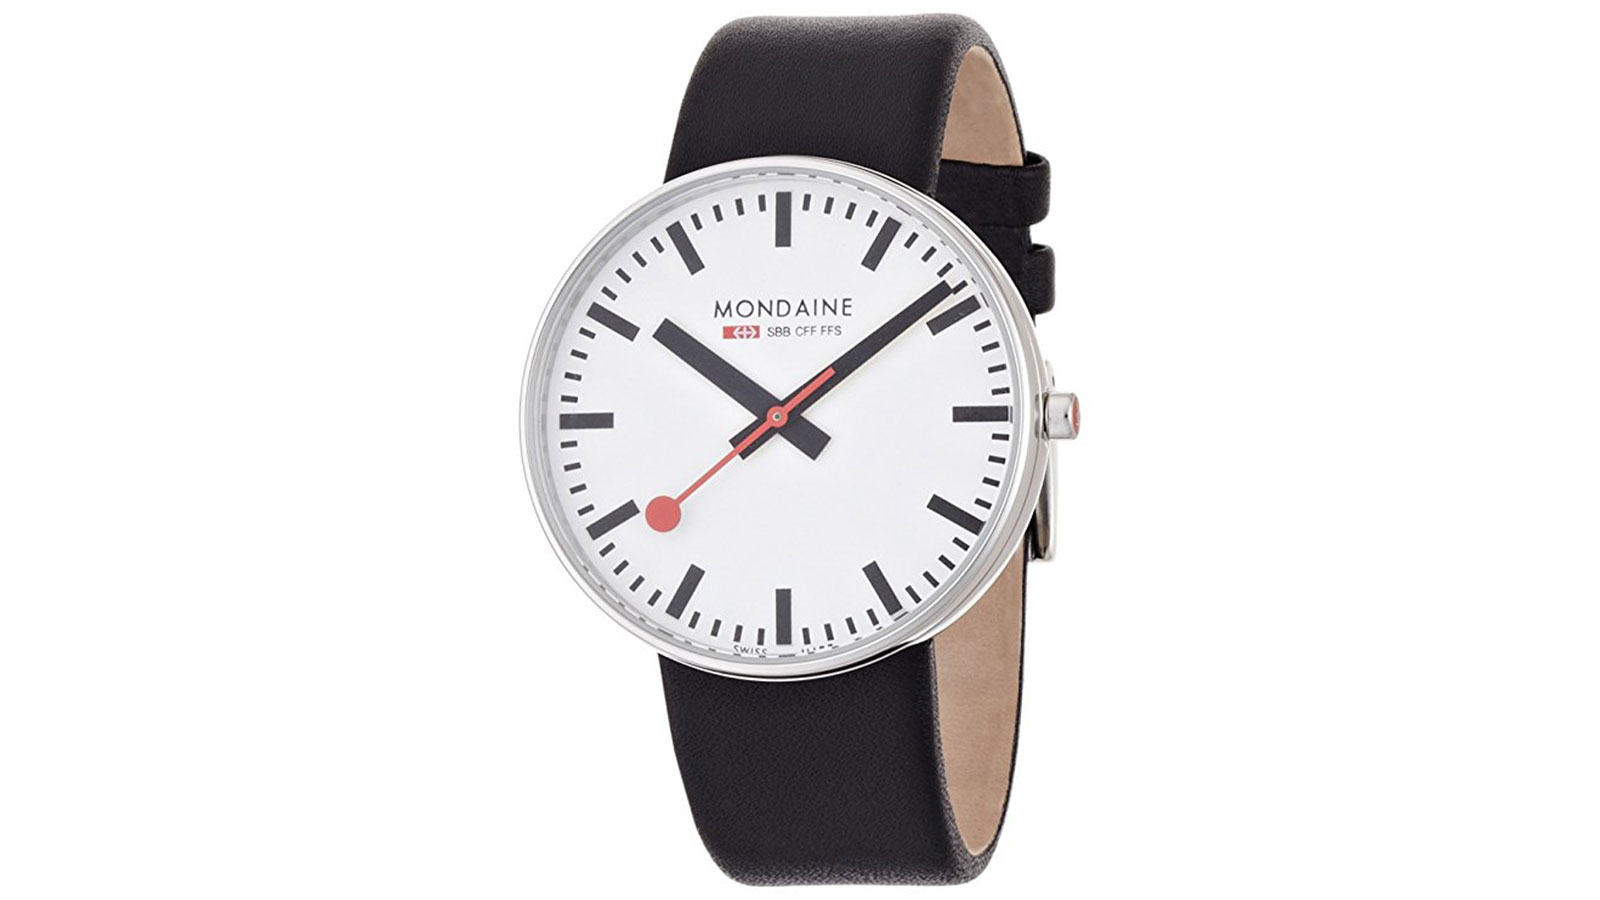 Mondaine Ultra-Thin Watch